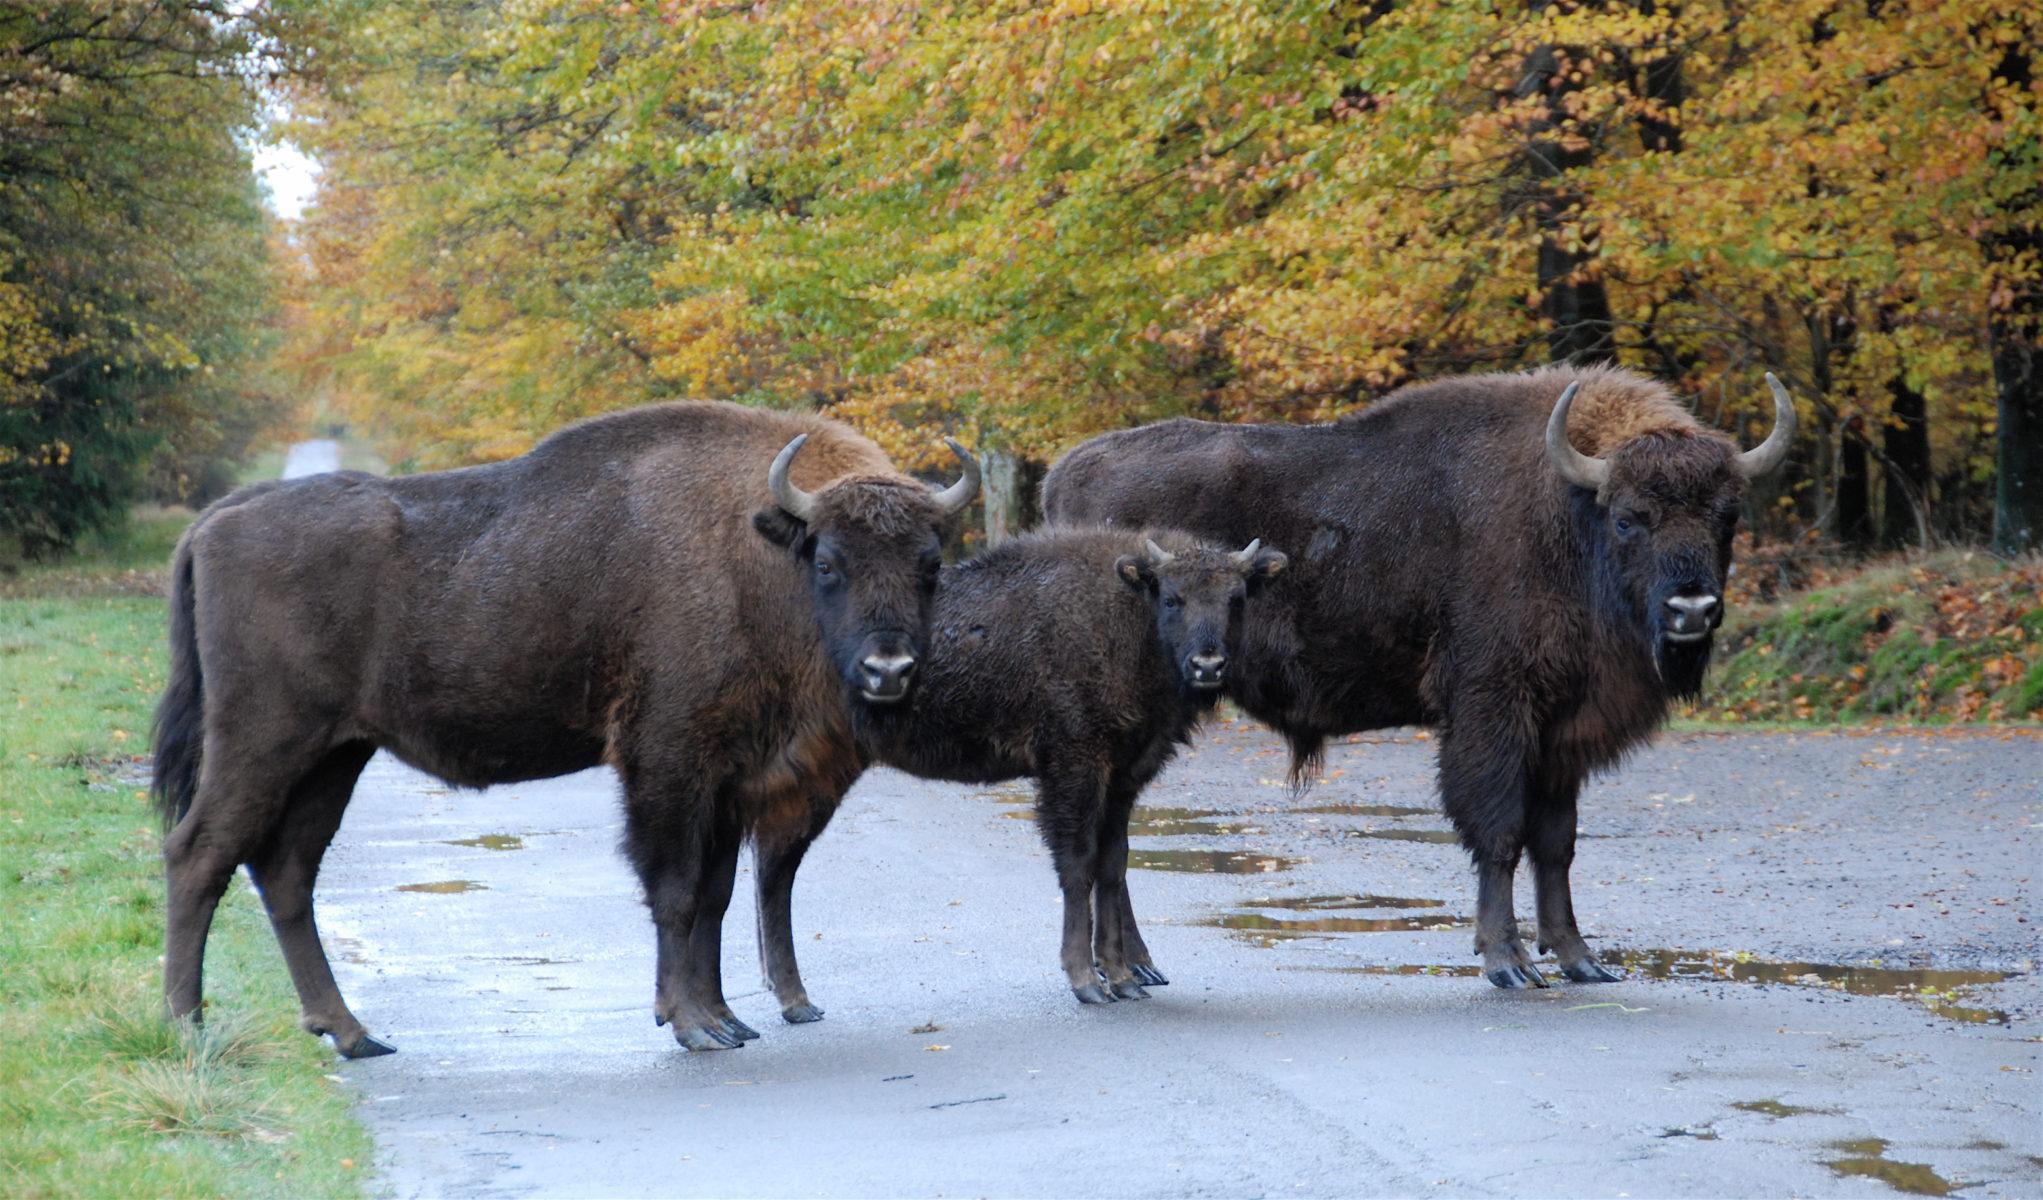 bison_ko-kviekalv-og-stor-tyrekalv-paa-vejen_1_bisonskoven_1-11-2016_mic